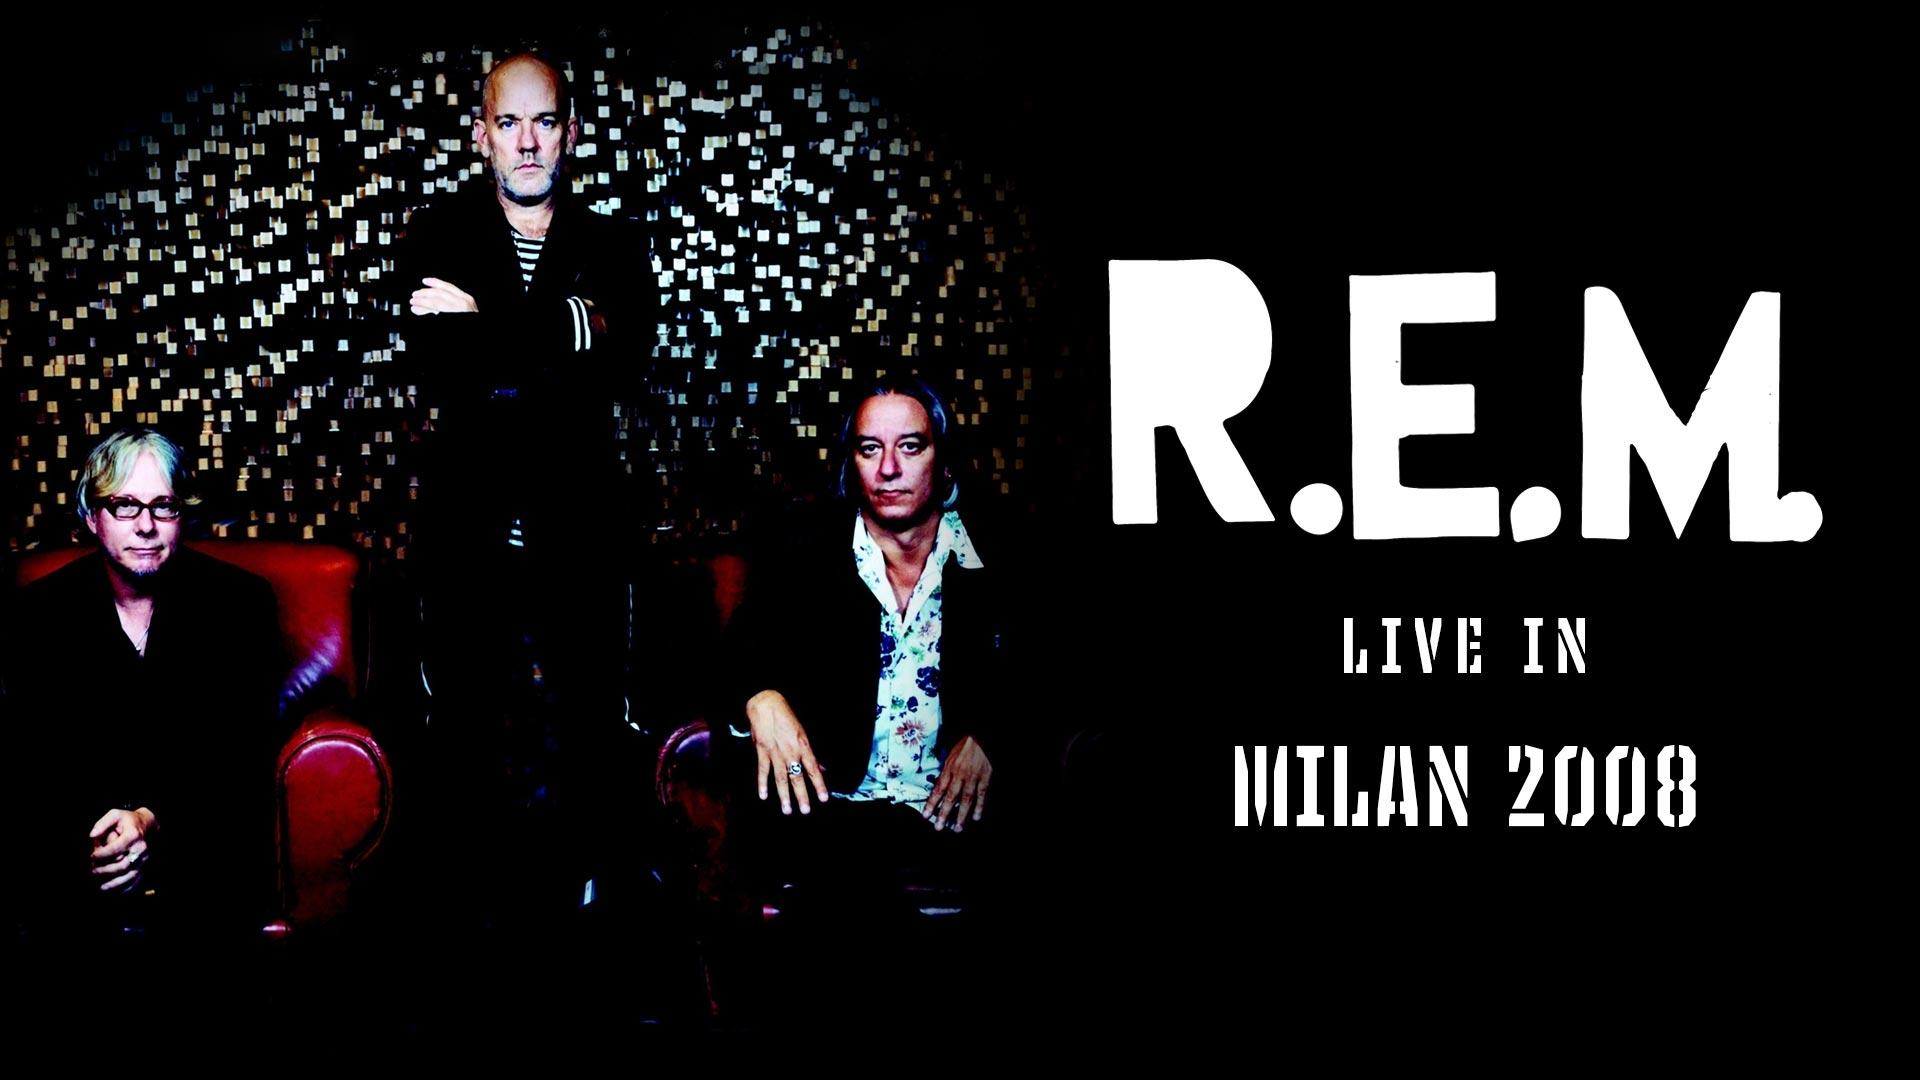 R.E.M.: Live in Milan 2008